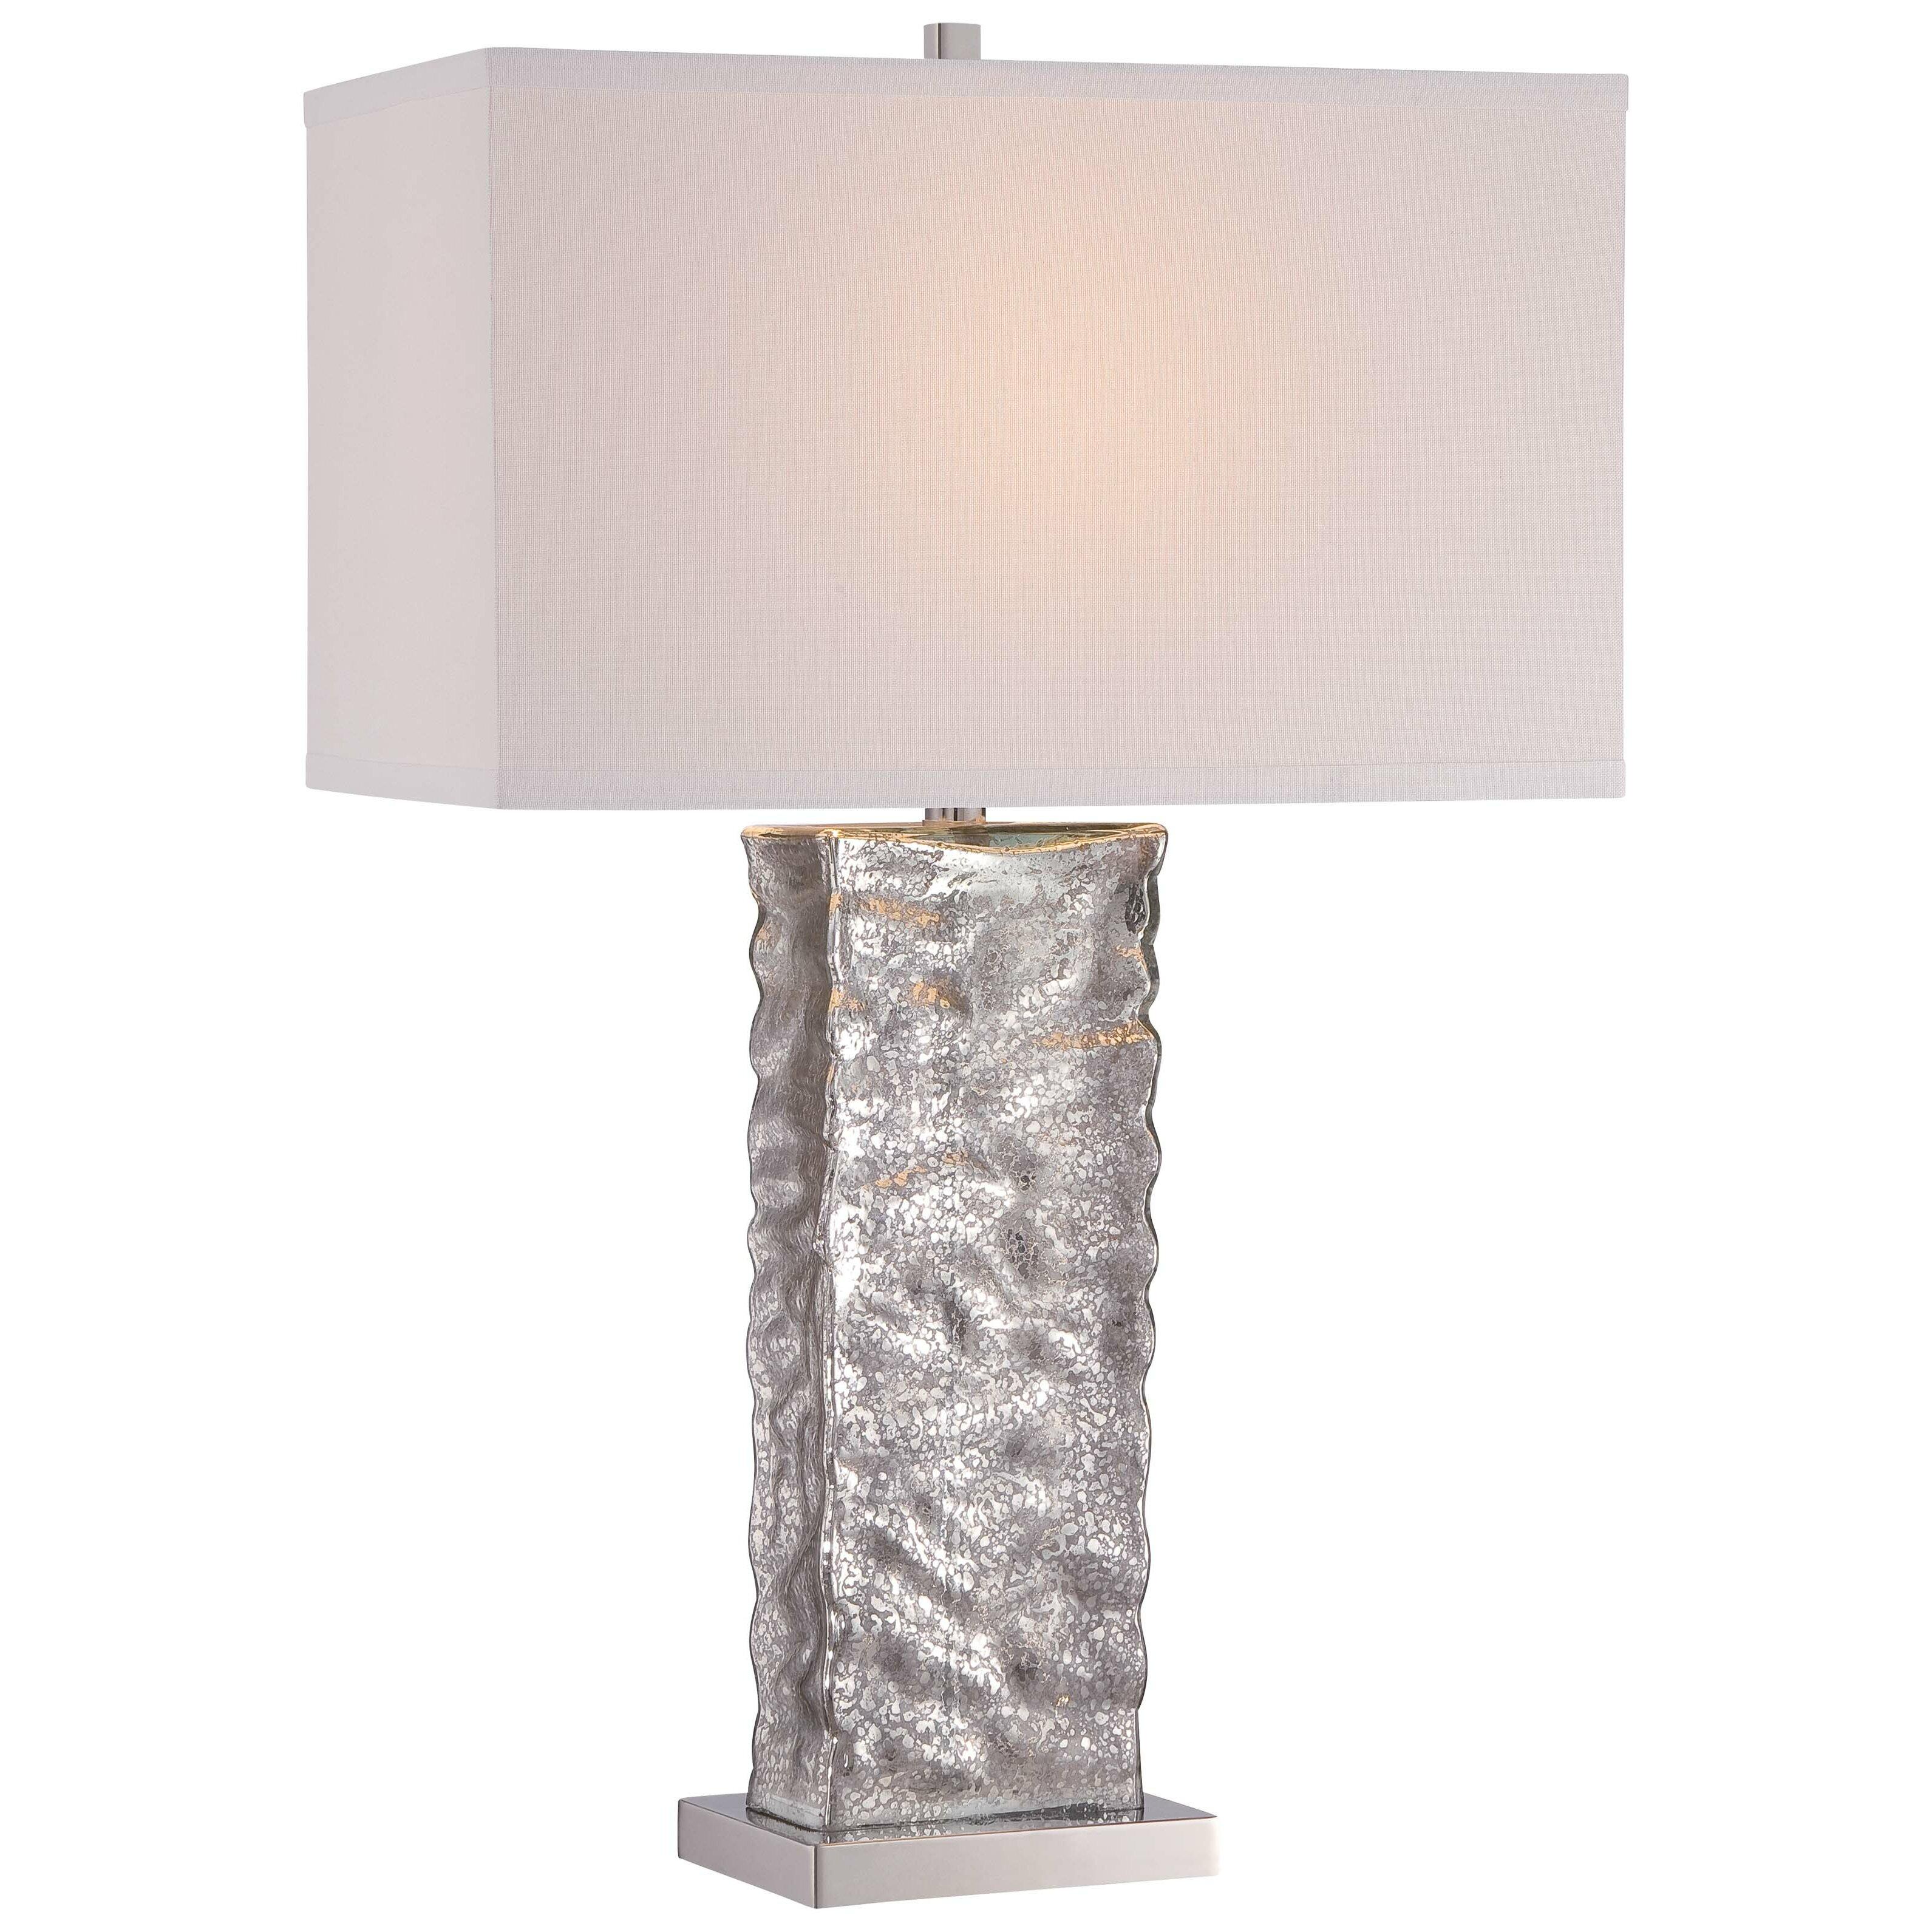 lighting lamps polished nickel table lamps minka lavery sku. Black Bedroom Furniture Sets. Home Design Ideas